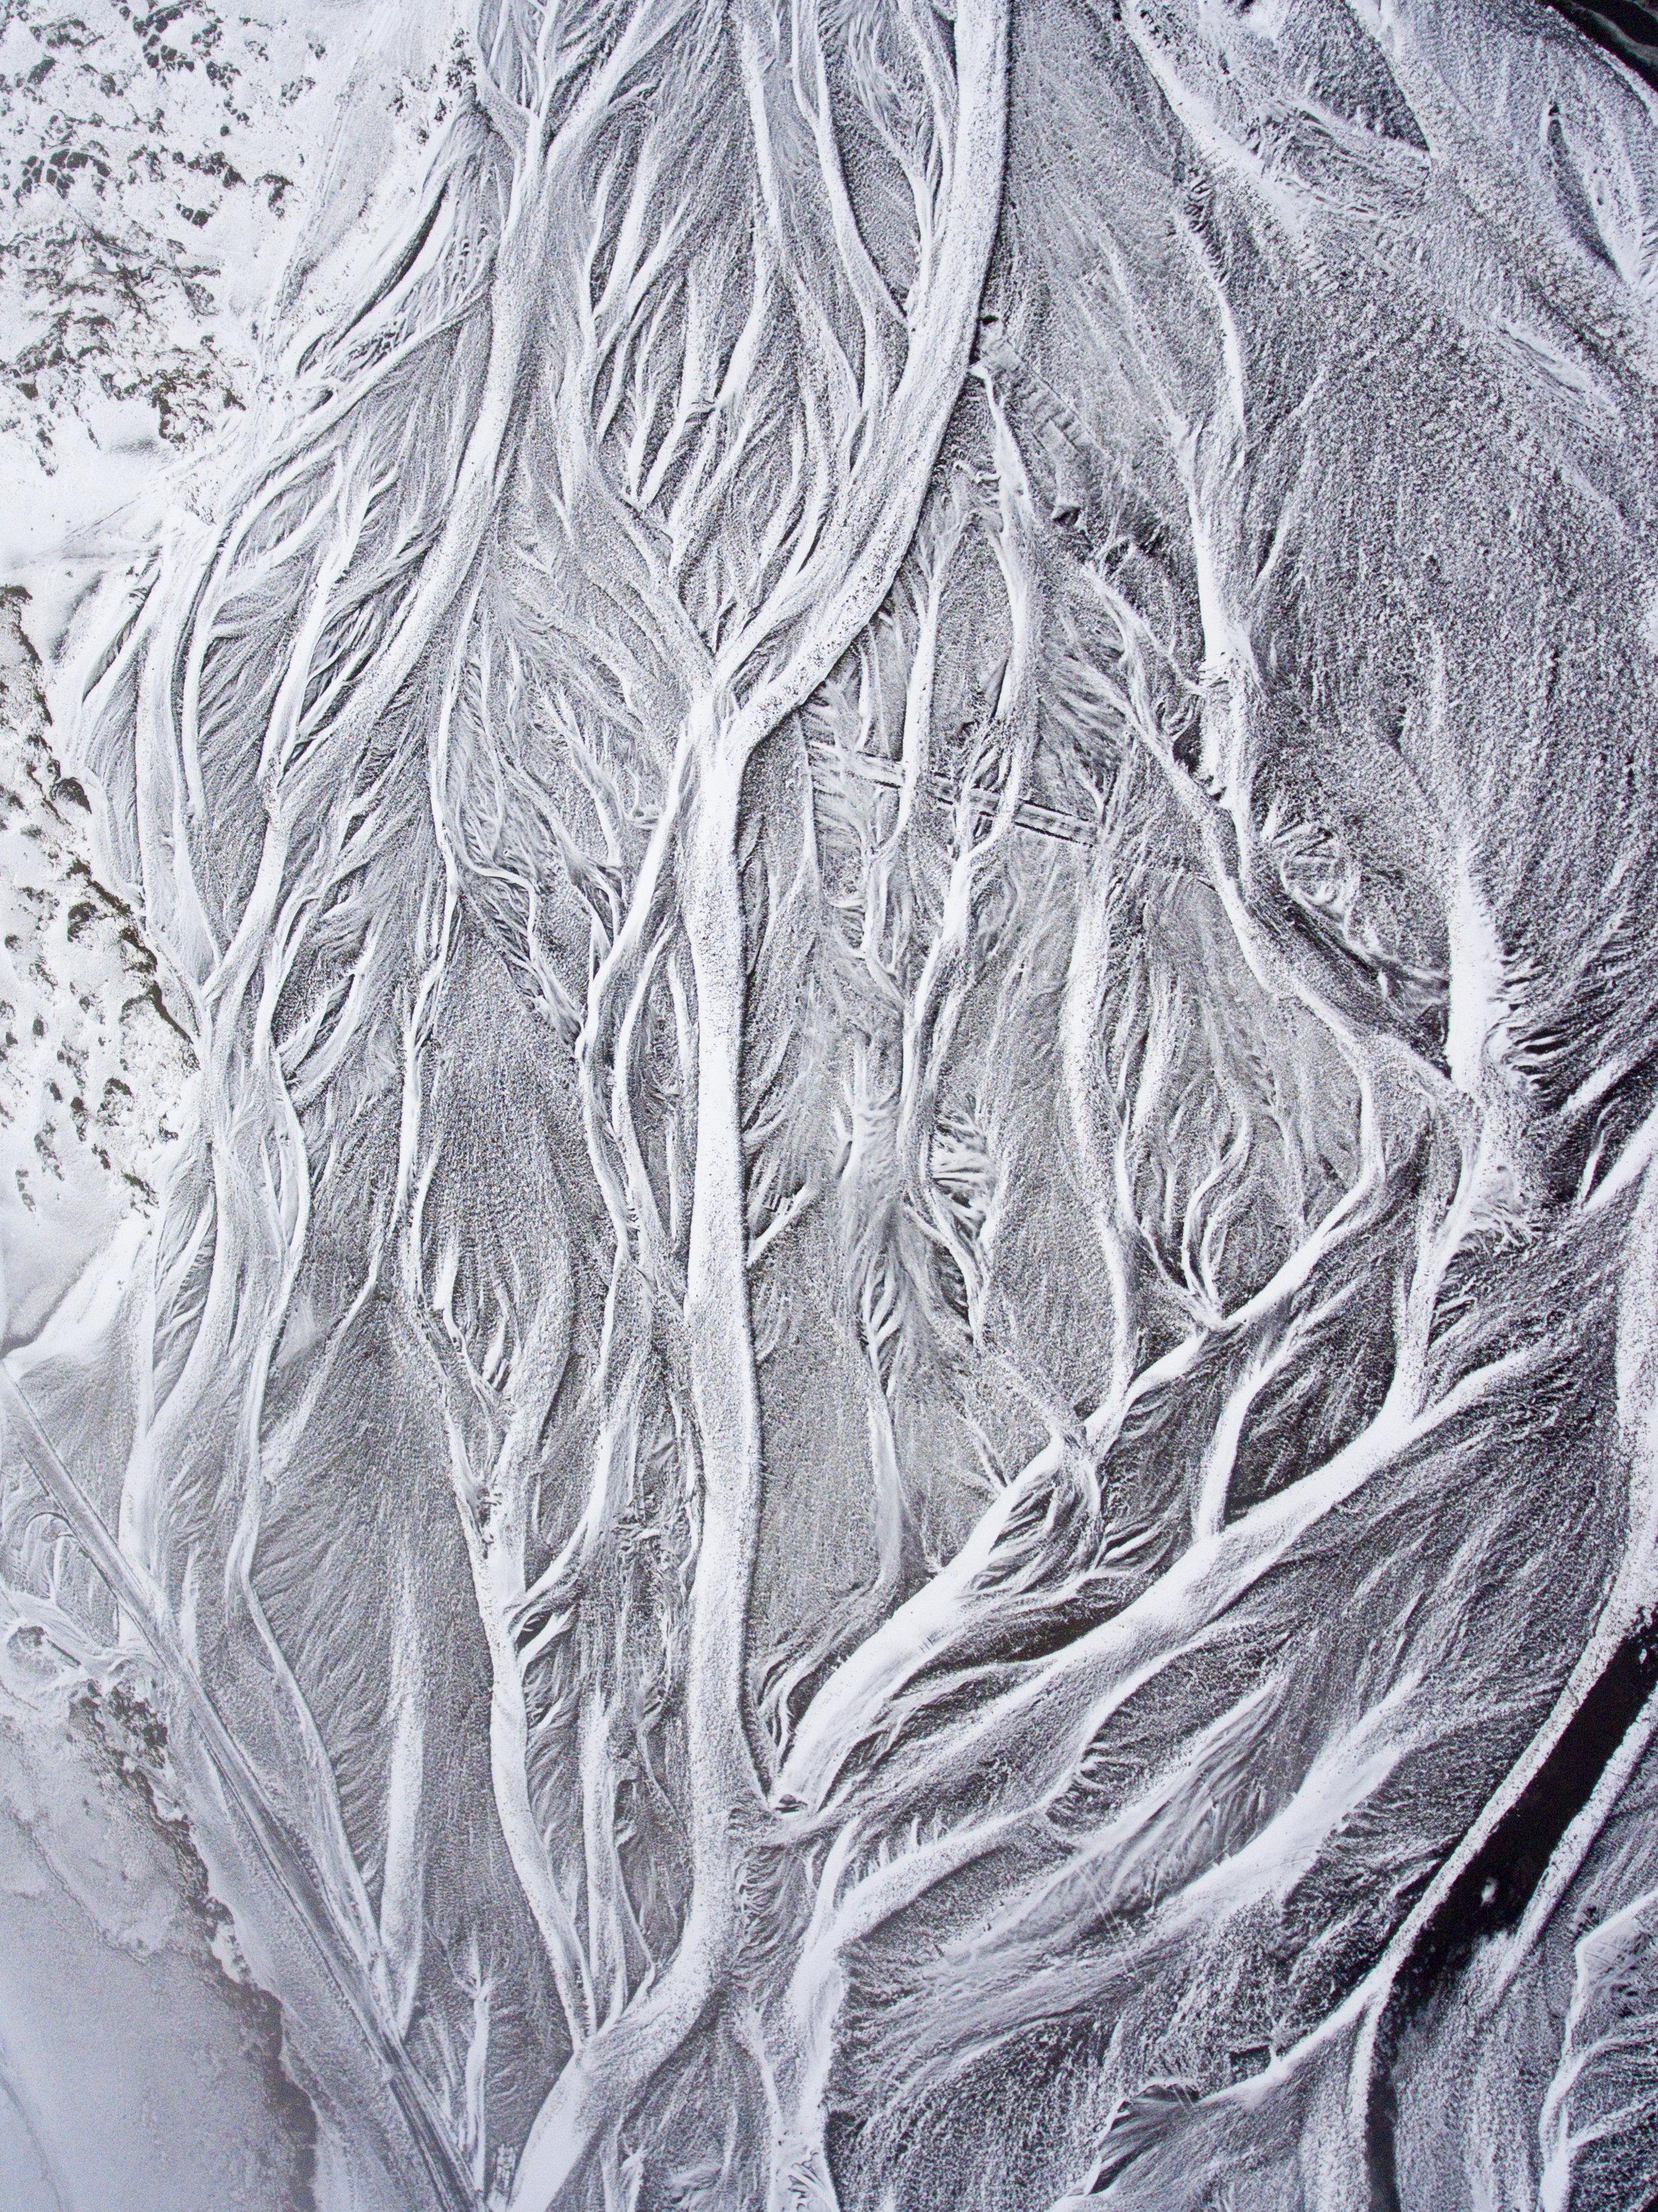 jermiah-schuster-iceland-270.jpg